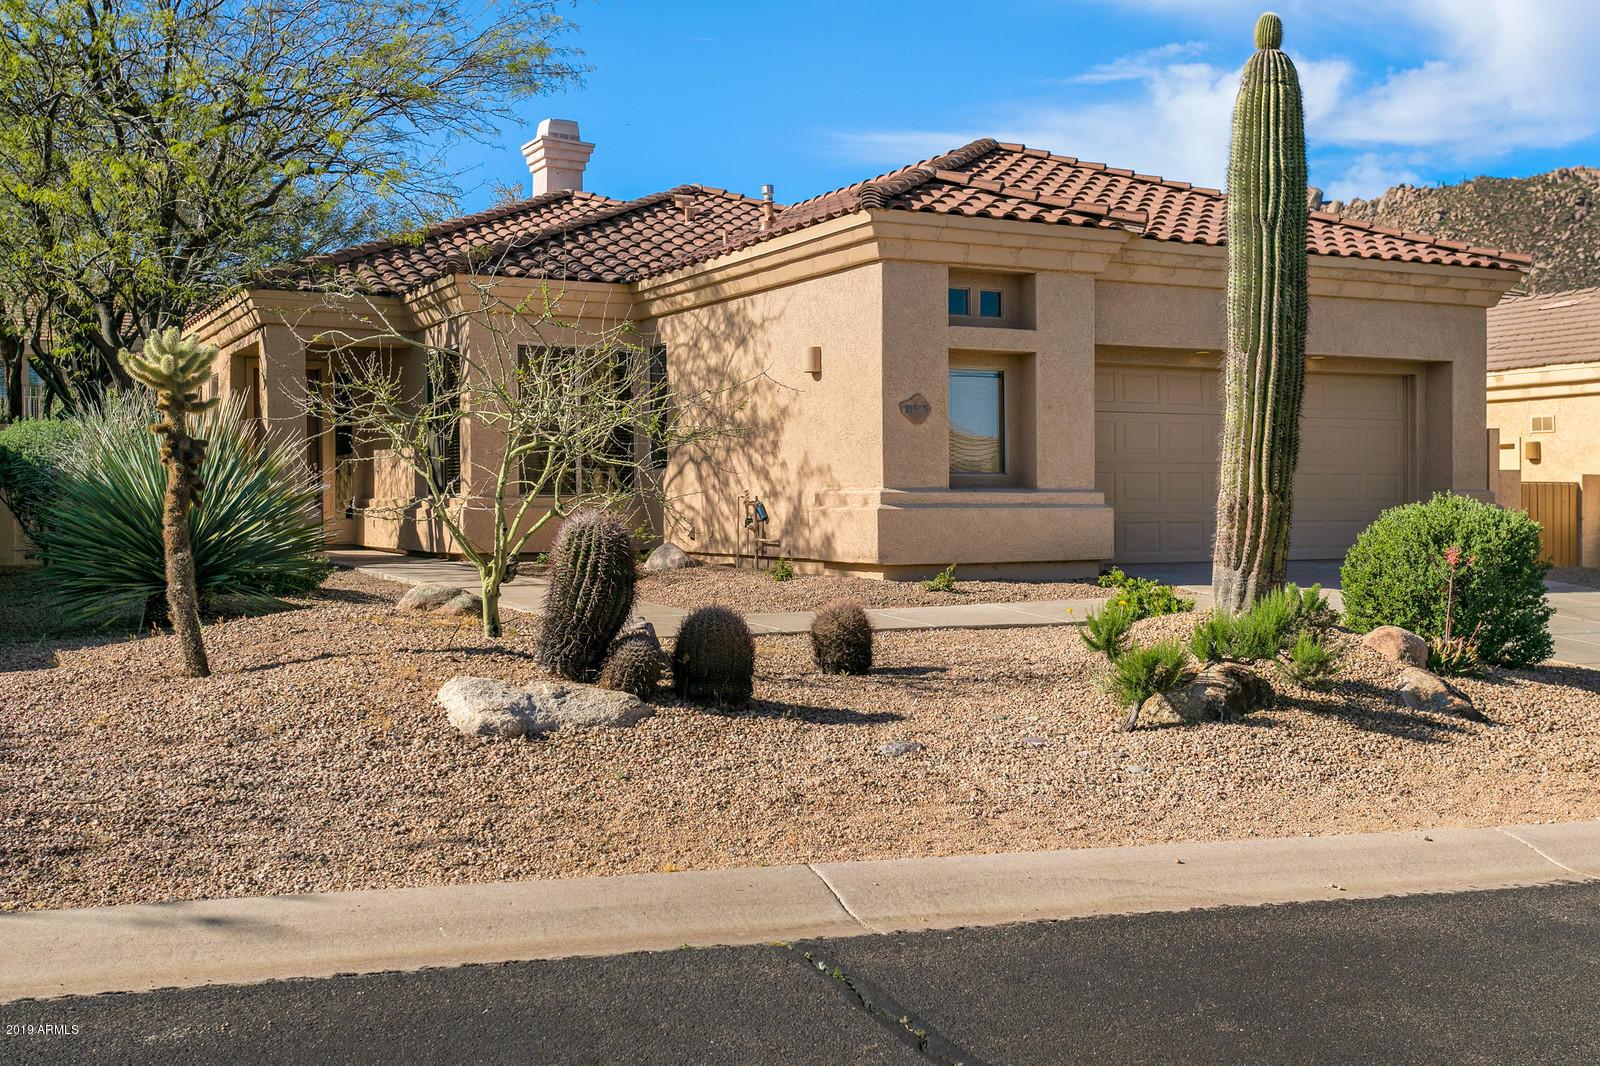 11555 E DIAMOND CHOLLA Drive, Scottsdale, Arizona